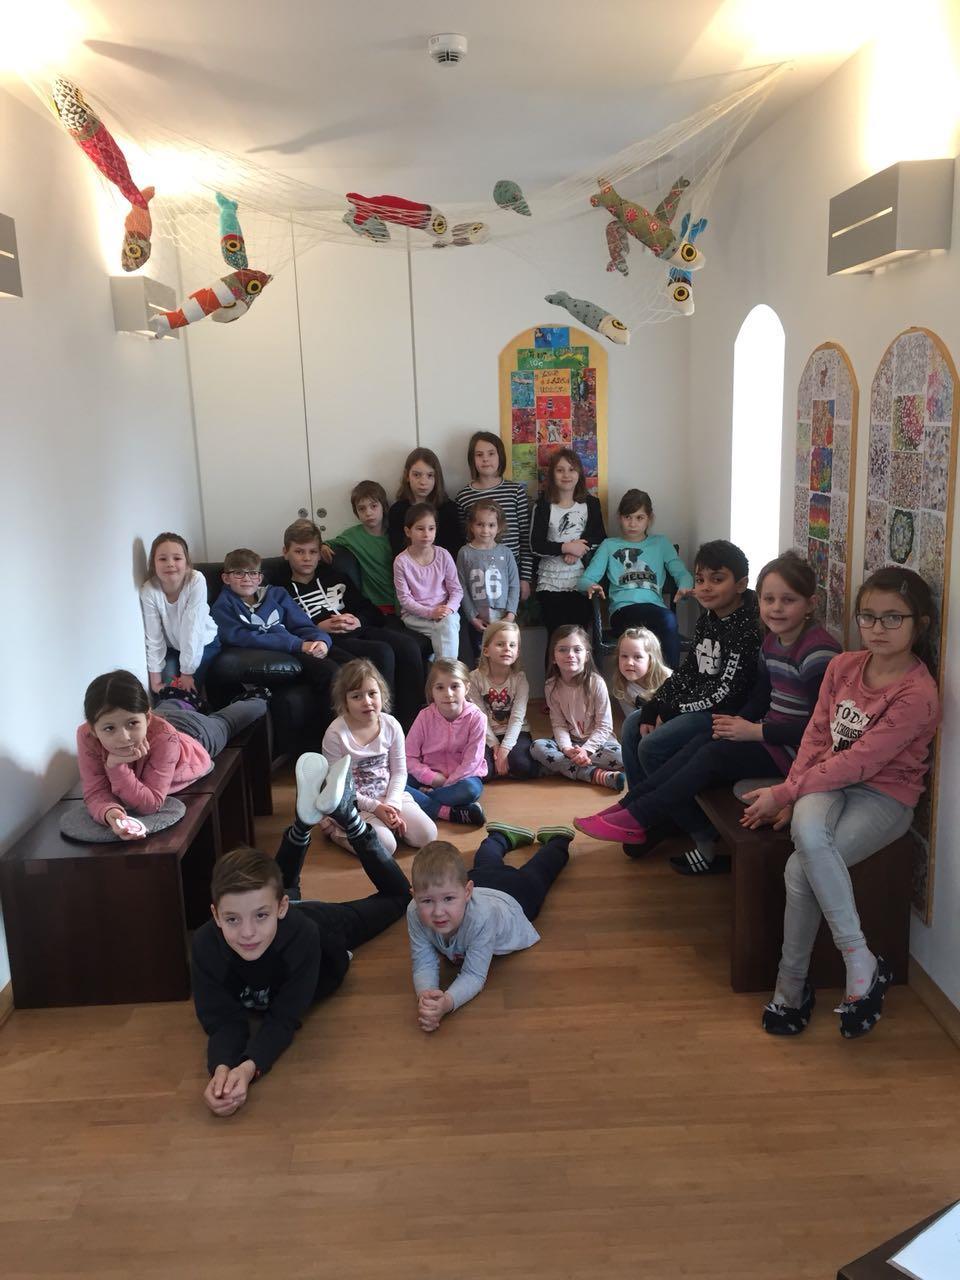 Kindermagiere Caritas Westfalenhaus Mutter Kind Vorsorge Klinik